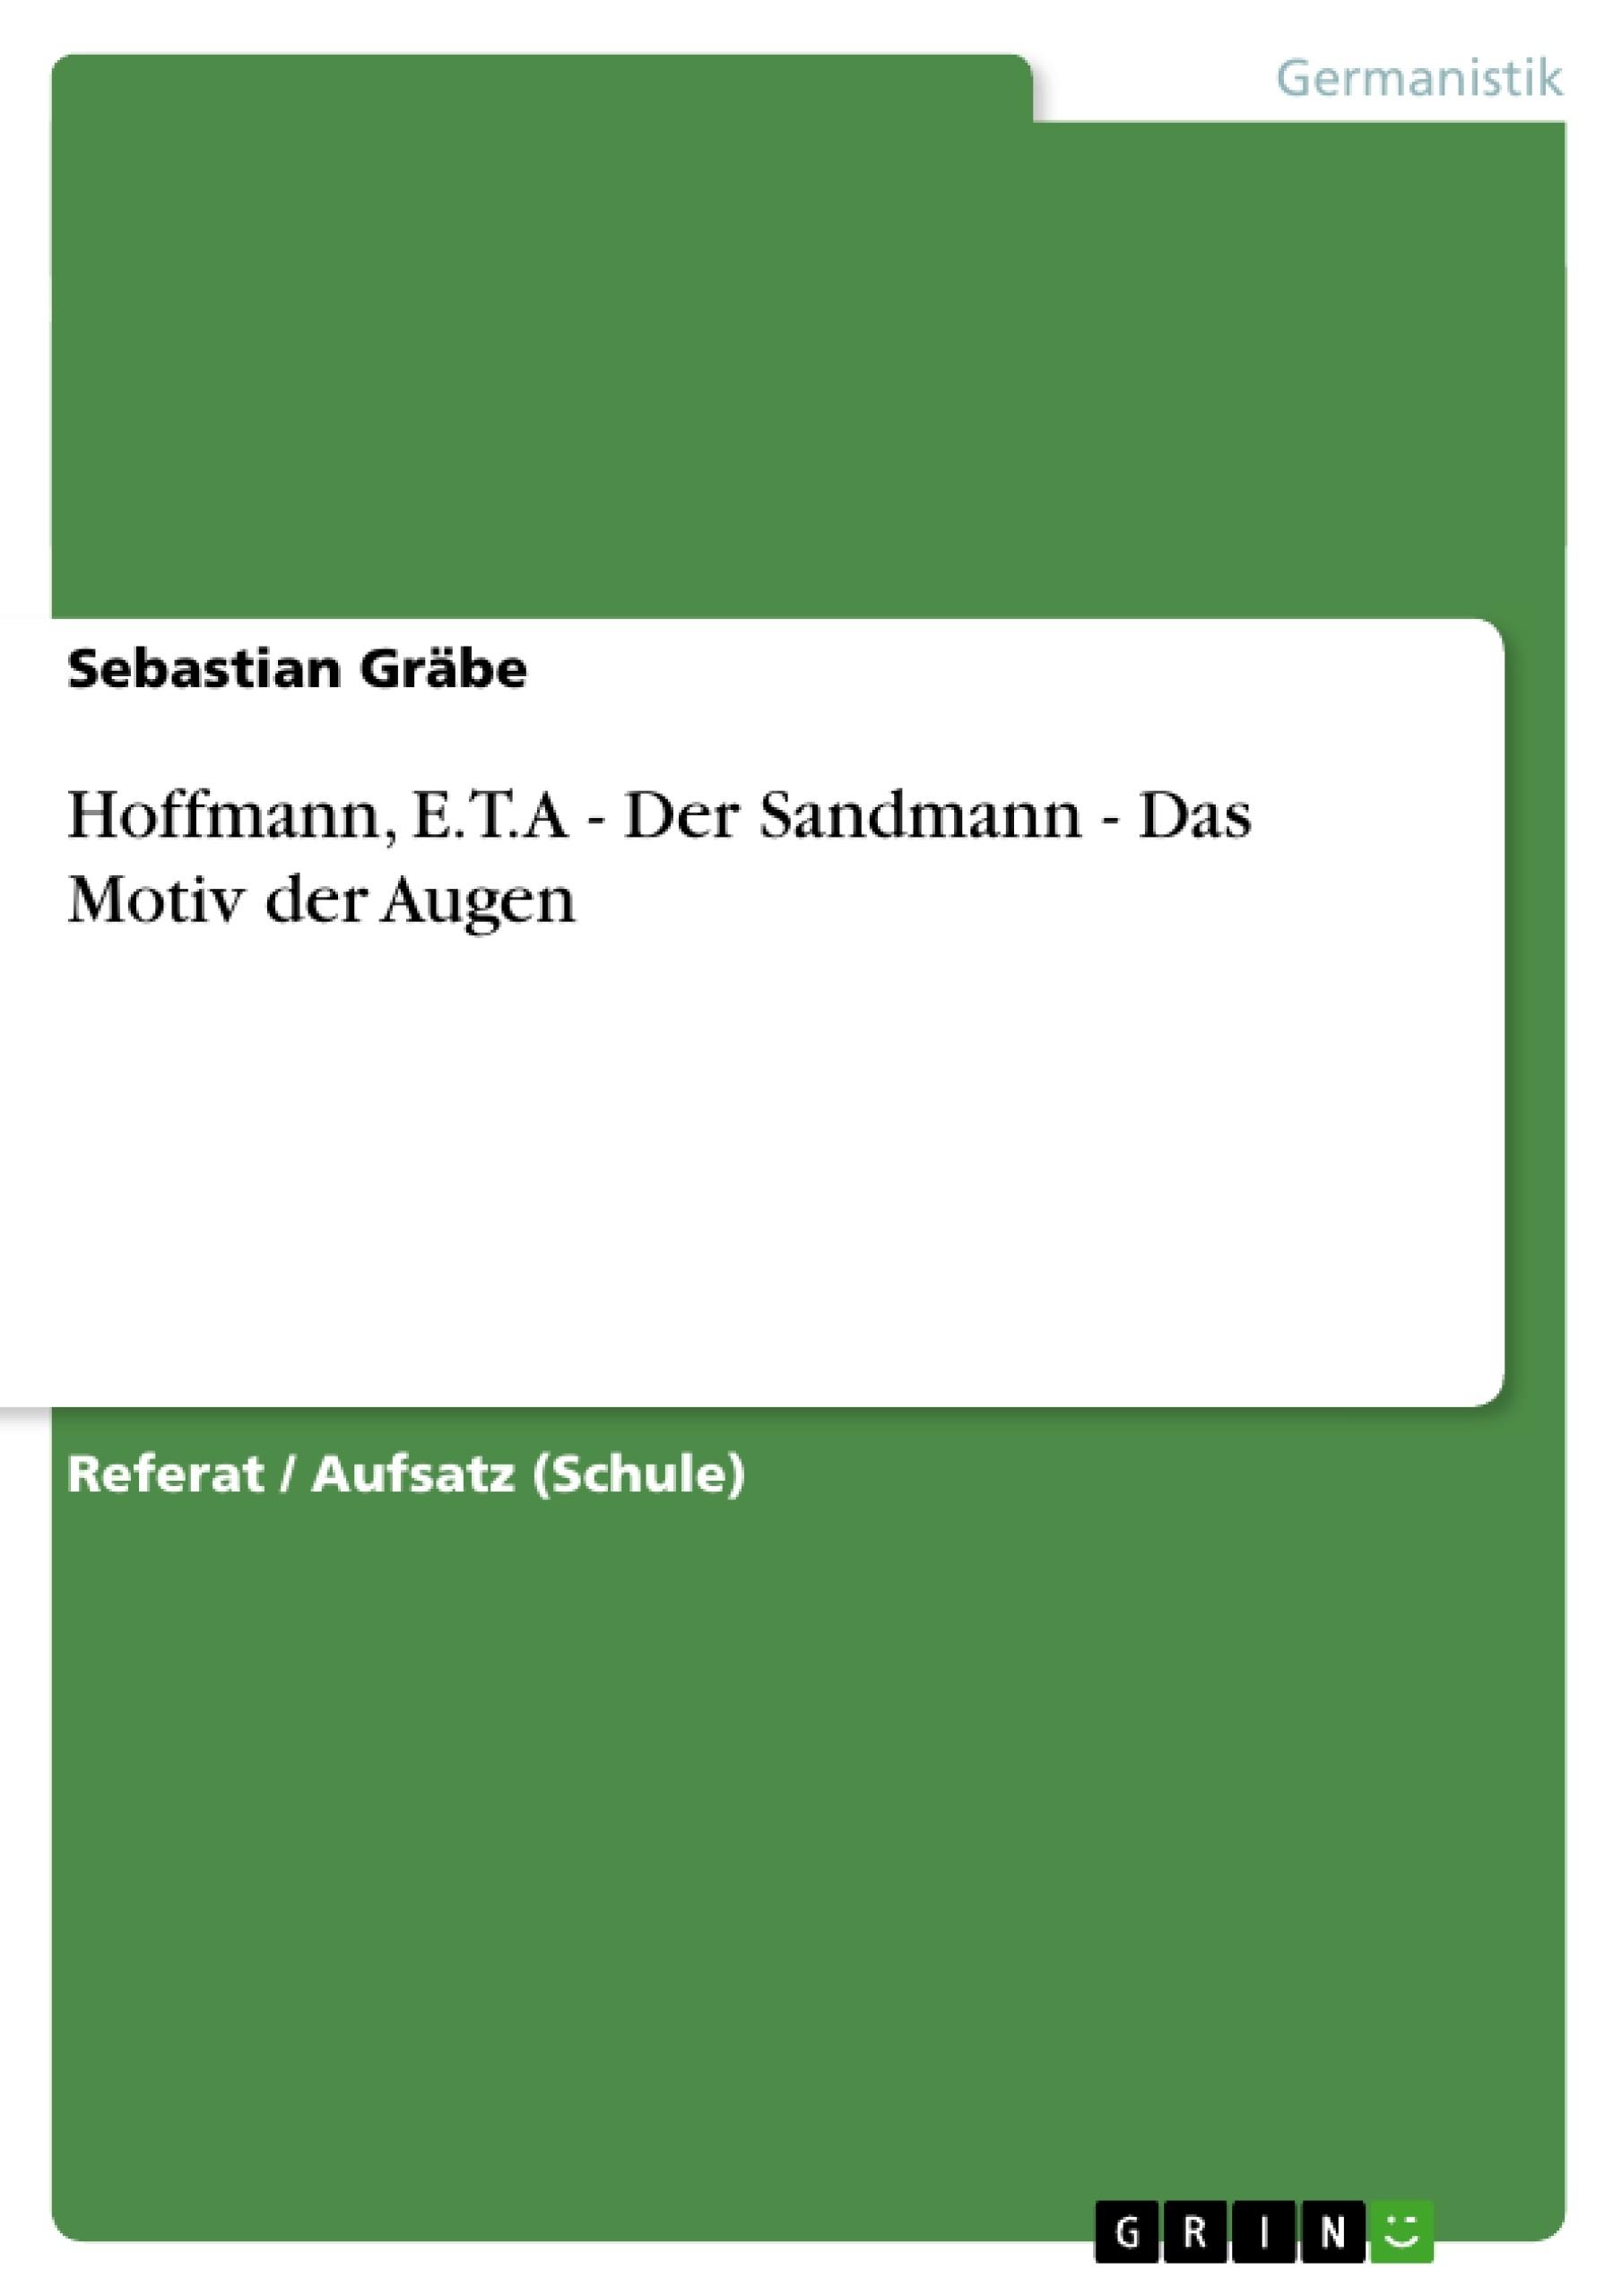 Titel: Hoffmann, E.T.A - Der Sandmann - Das Motiv der Augen